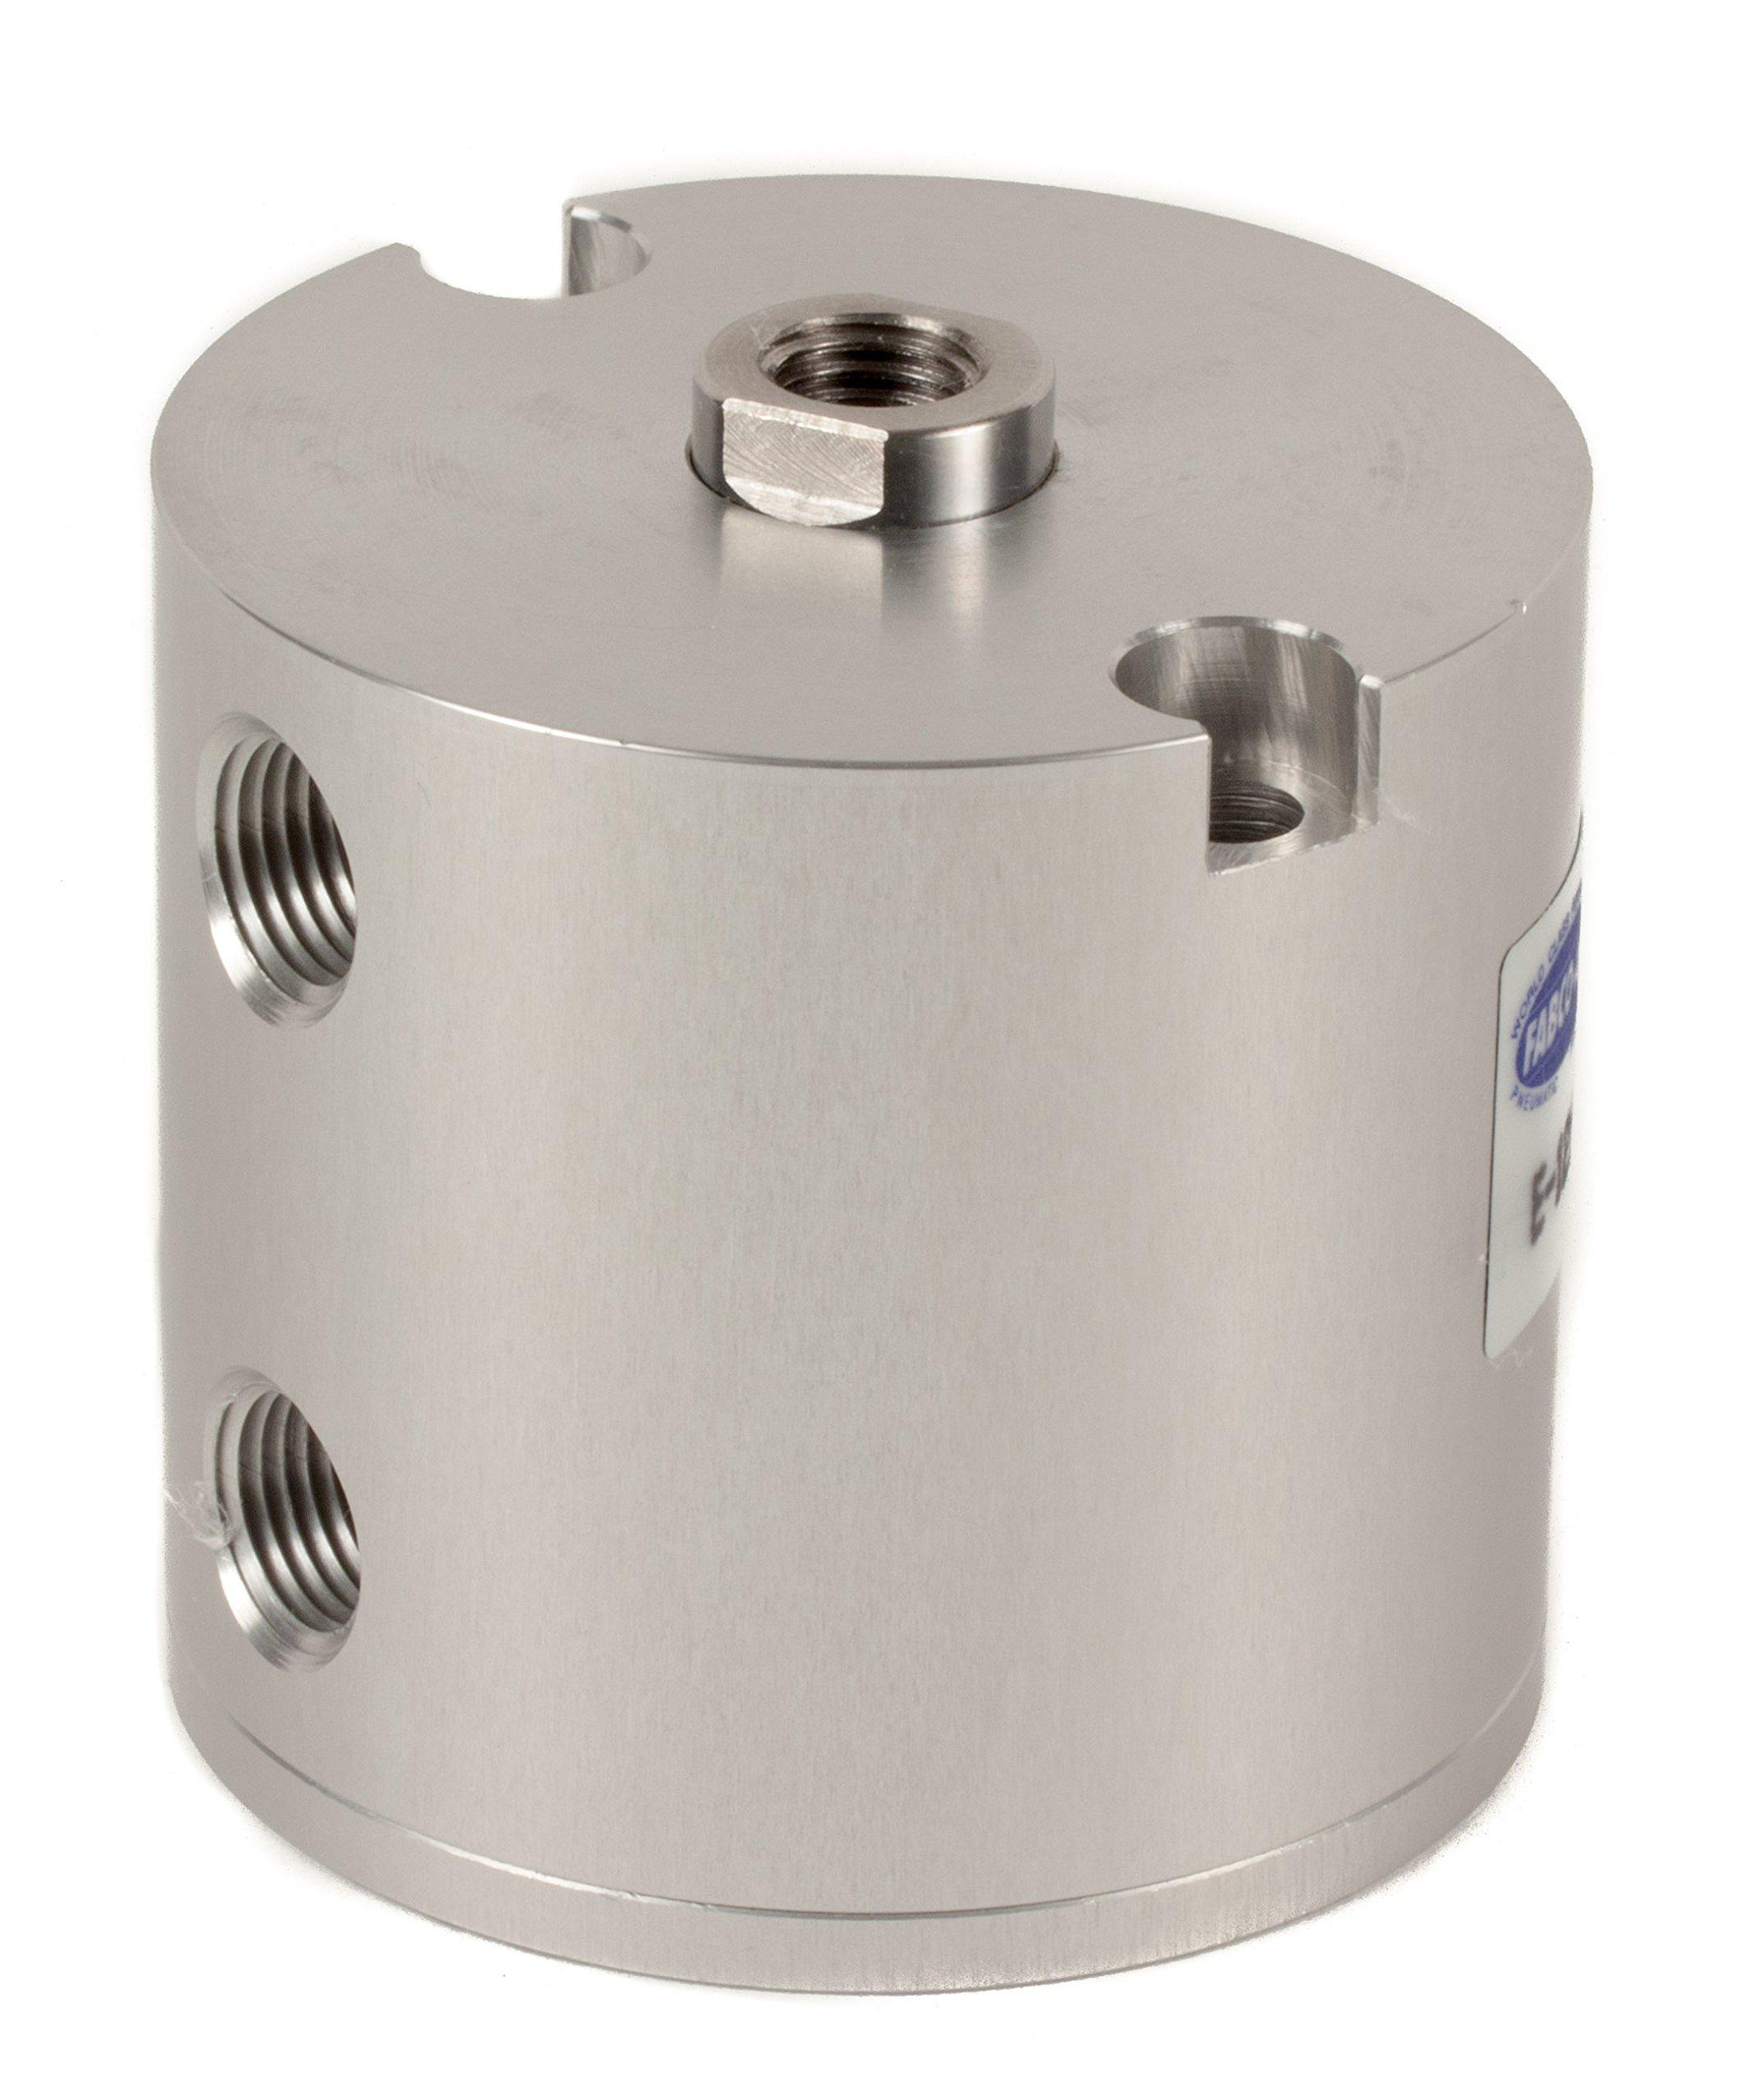 Fabco-Air E-121-X Original Pancake Cylinder, Double Acting, Maximum Pressure of 250 PSI, 1-1/8'' Bore Diameter x 1'' Stroke